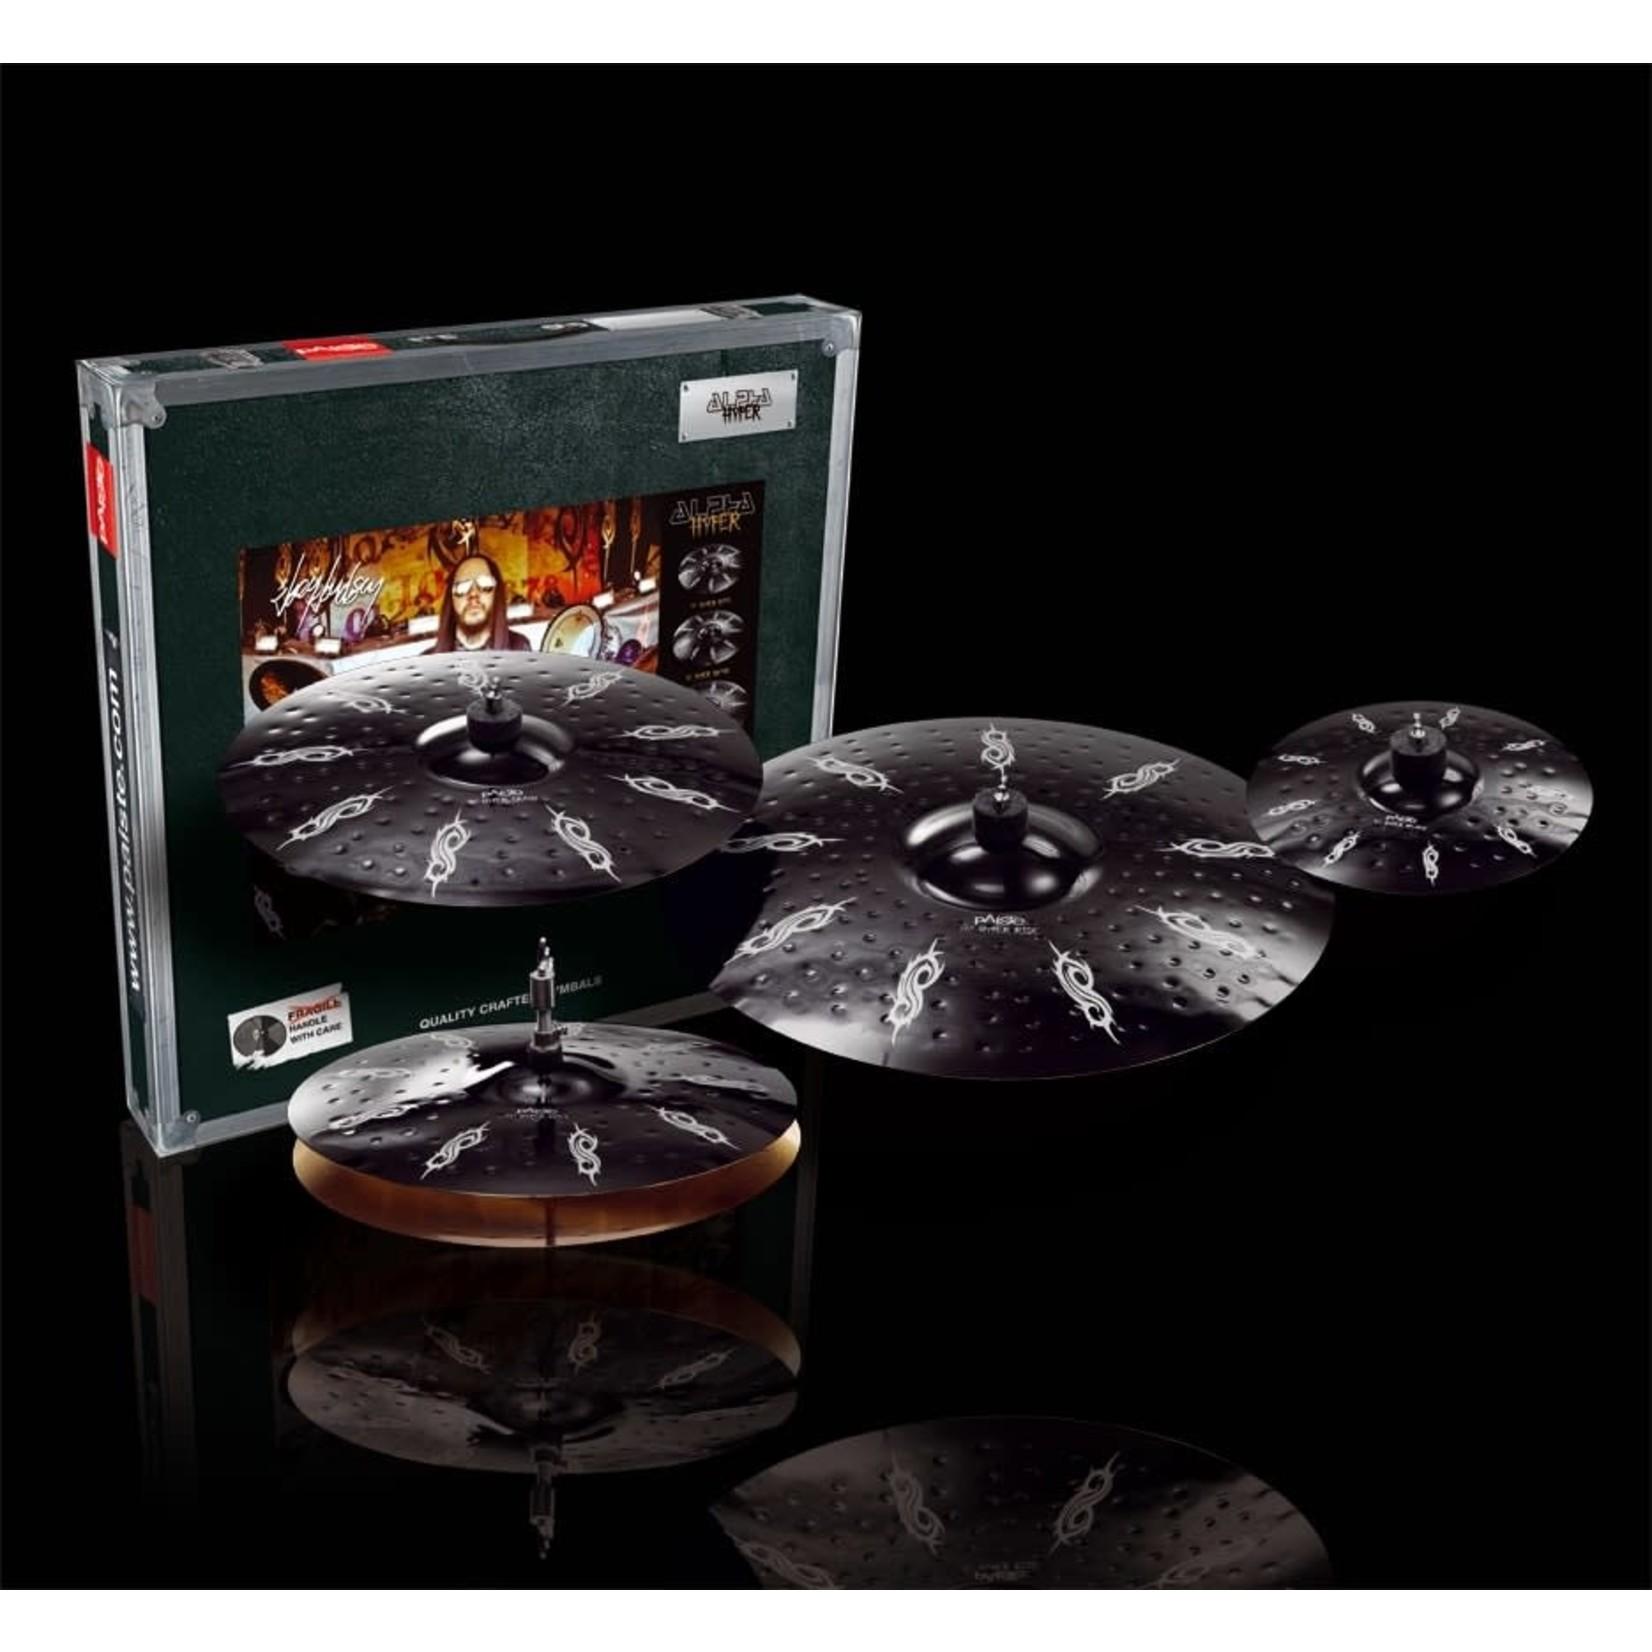 "Paiste Paiste Joey Jordison Black Alpha Hyper Cymbal Set - 14""/16""/20"" - With Free 10"" Splash Cymbal"